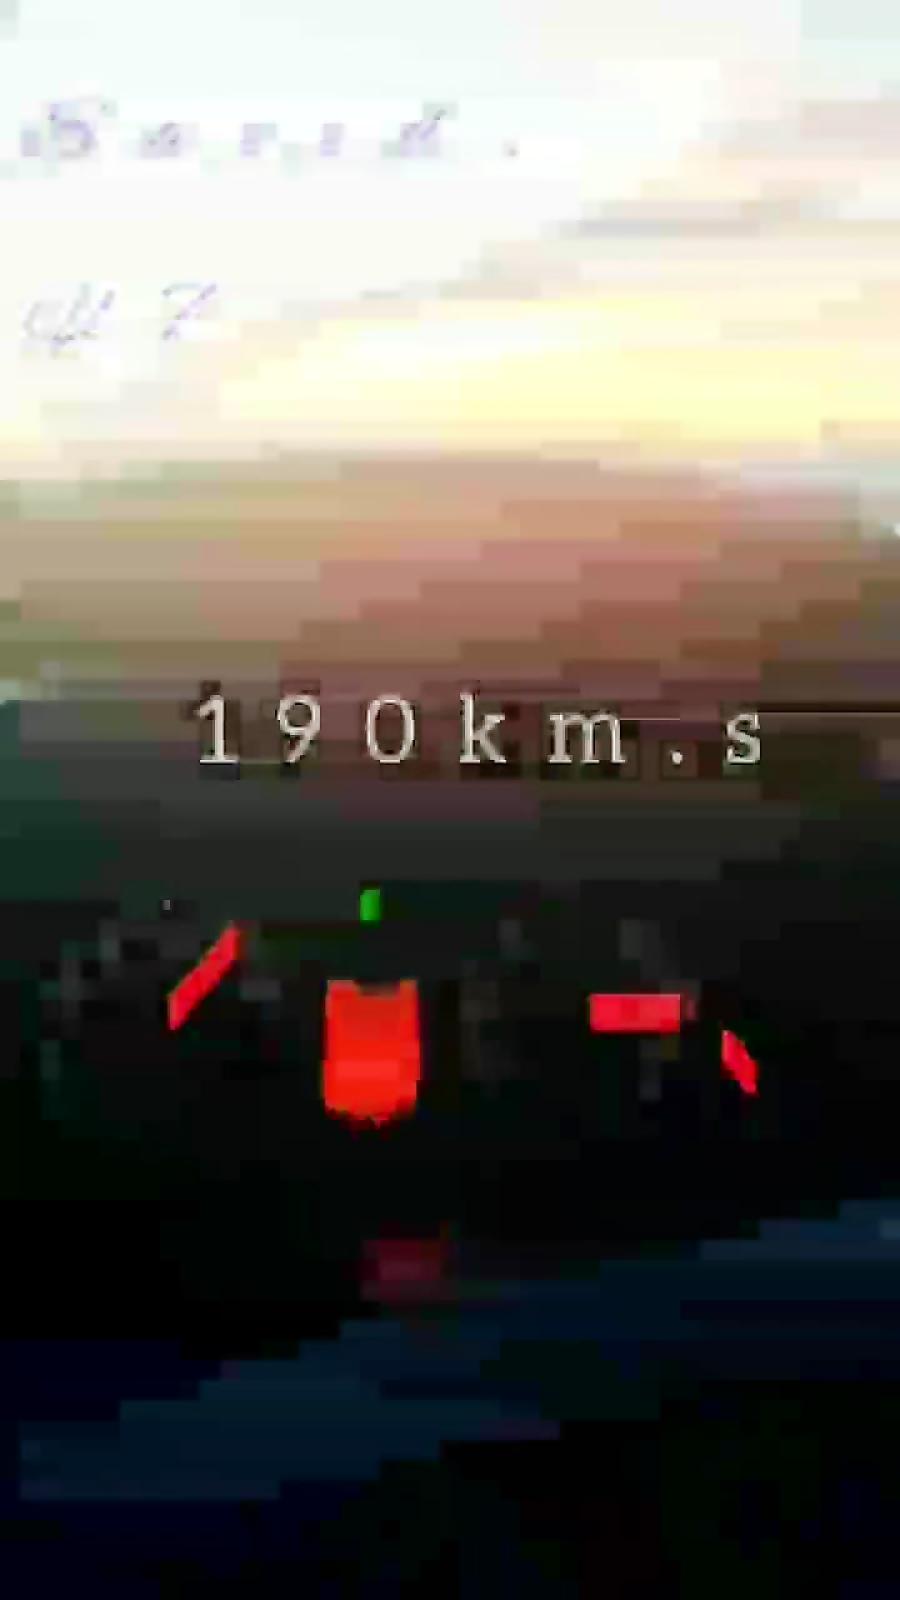 سرعت سورن موتور xu7 فابریک